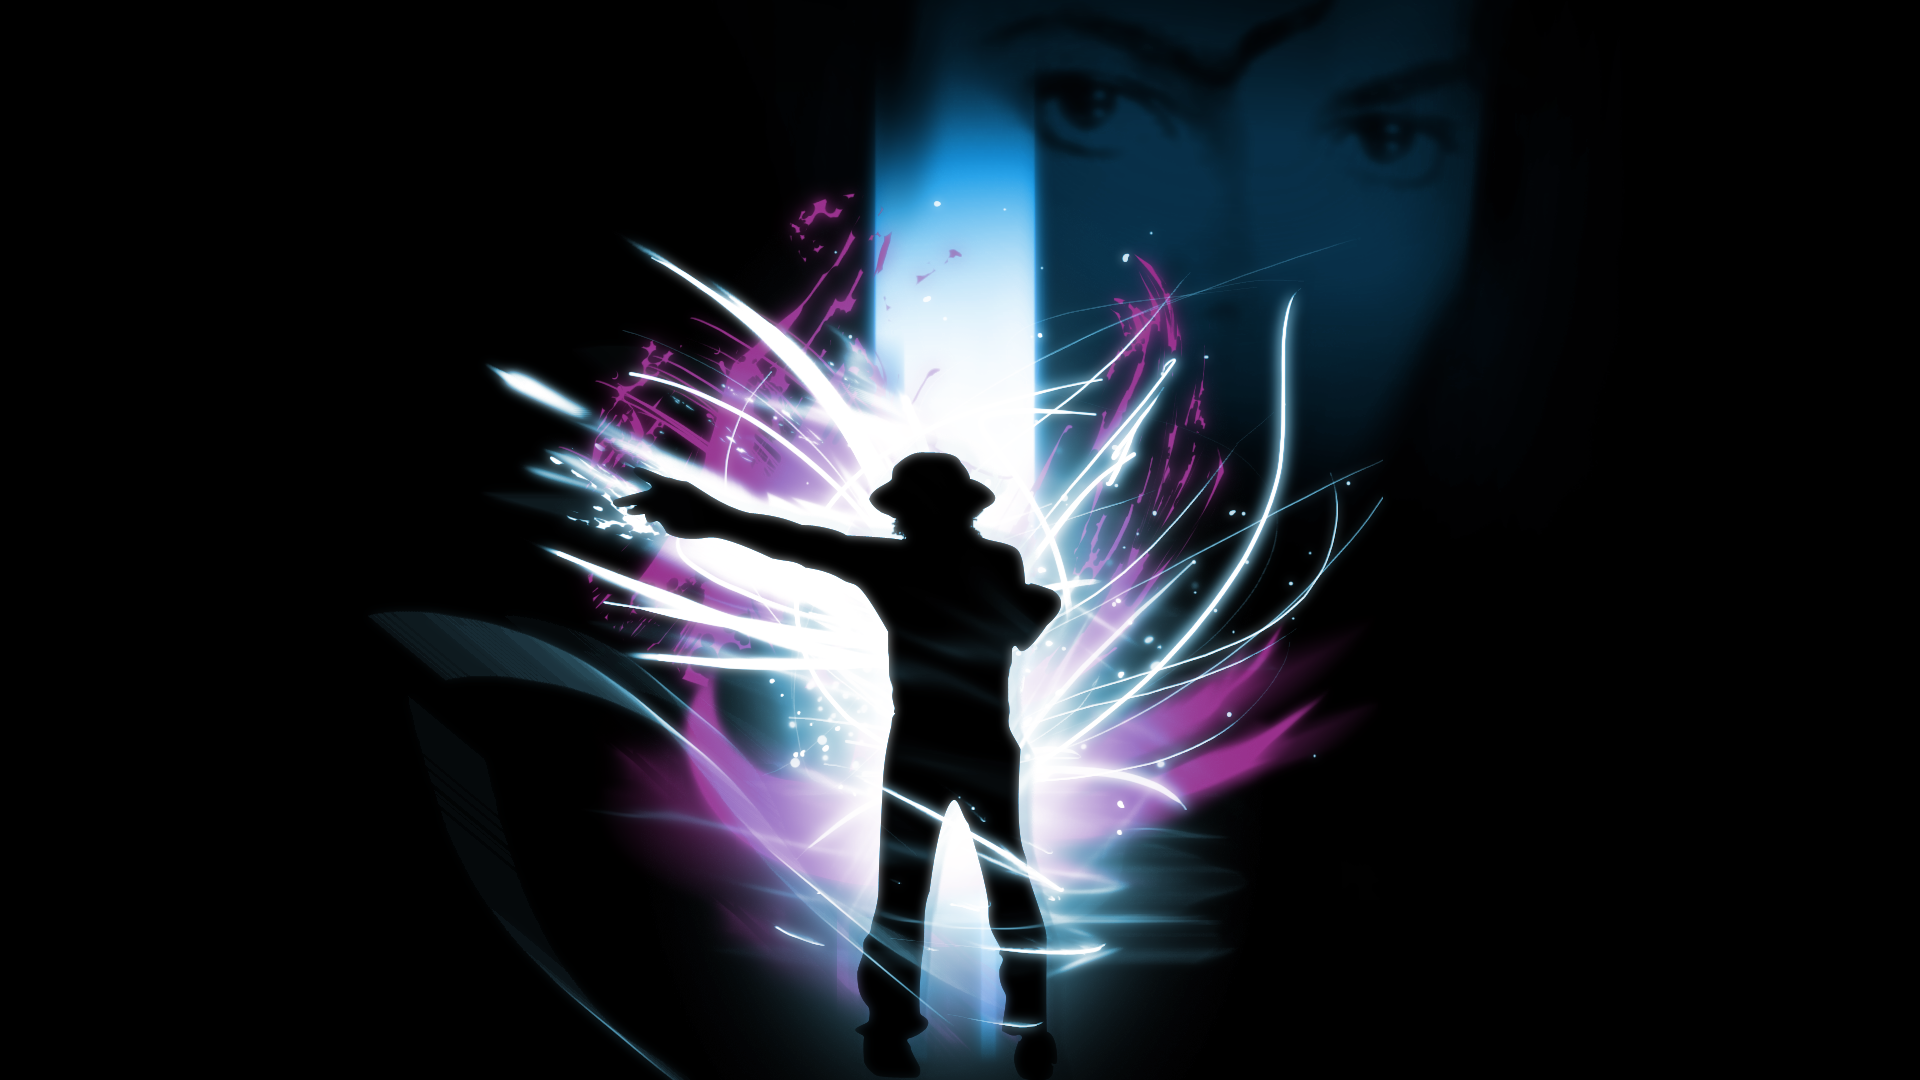 Michael Jackson Hd Wallpaper Background Image 1920x1080 Id